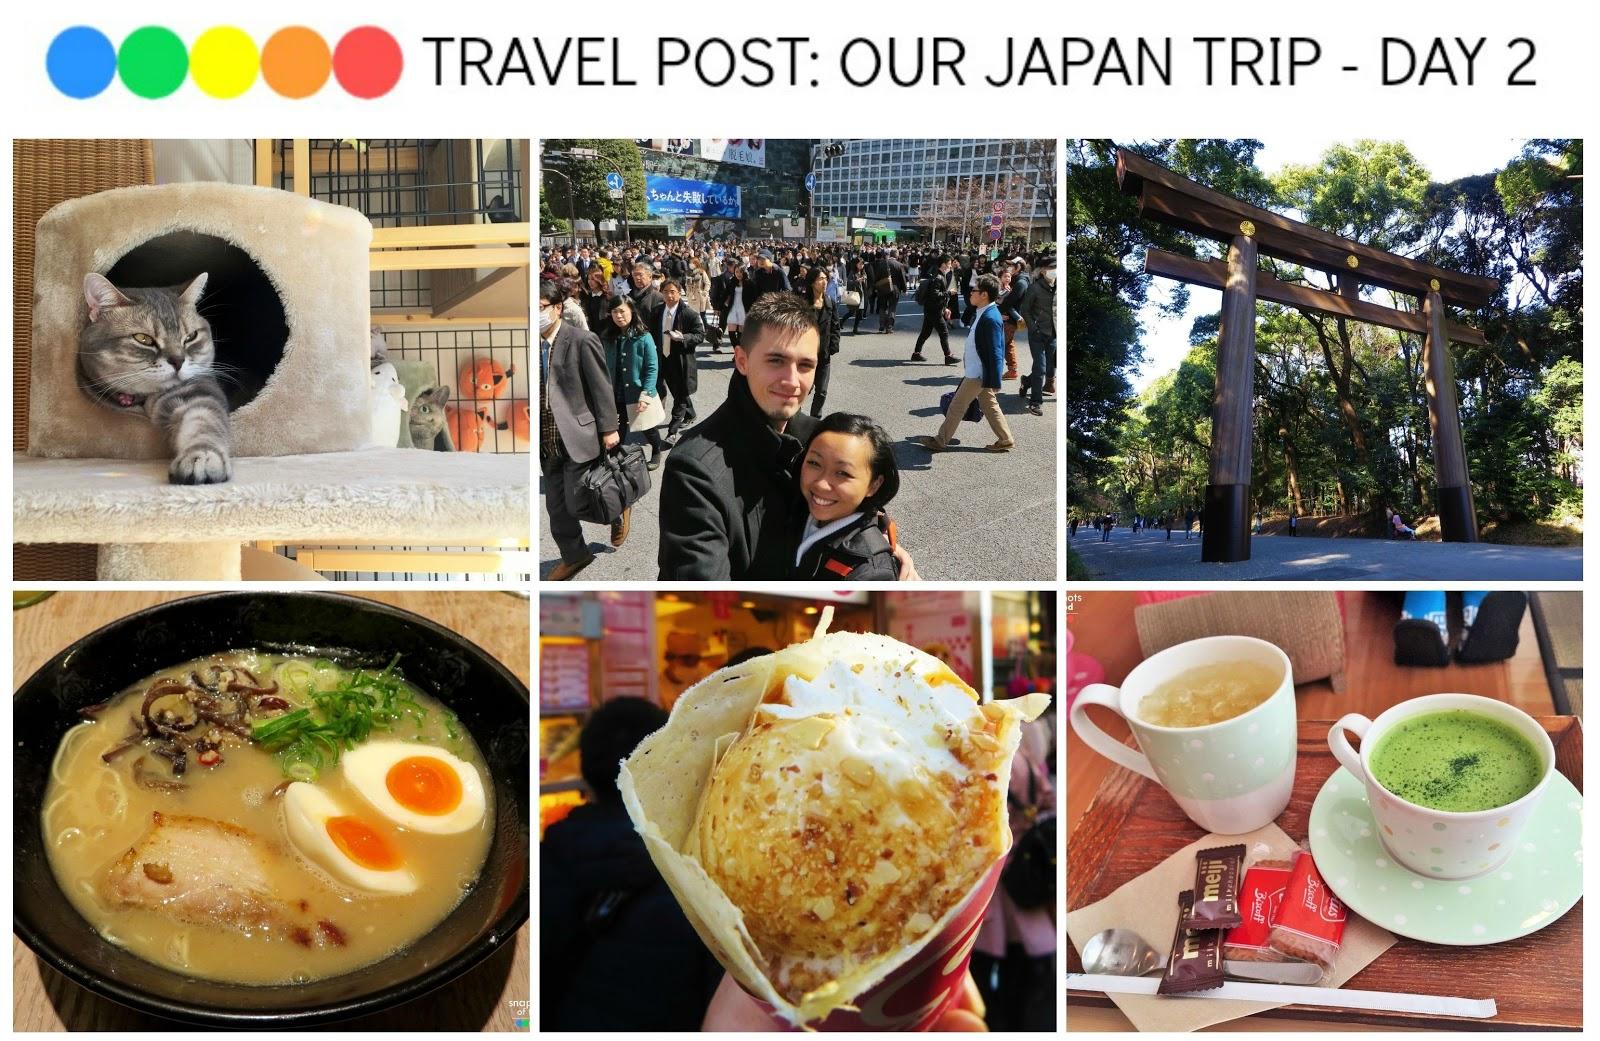 Travel Post: Our Japan Trip - Day 2 (Hapineko Cat Cafe, Shibuya Crossing, Kiddy Land, Takeshita Dori Street, SweetBox Crepes, Meiji Jingu, self-order Ramen)